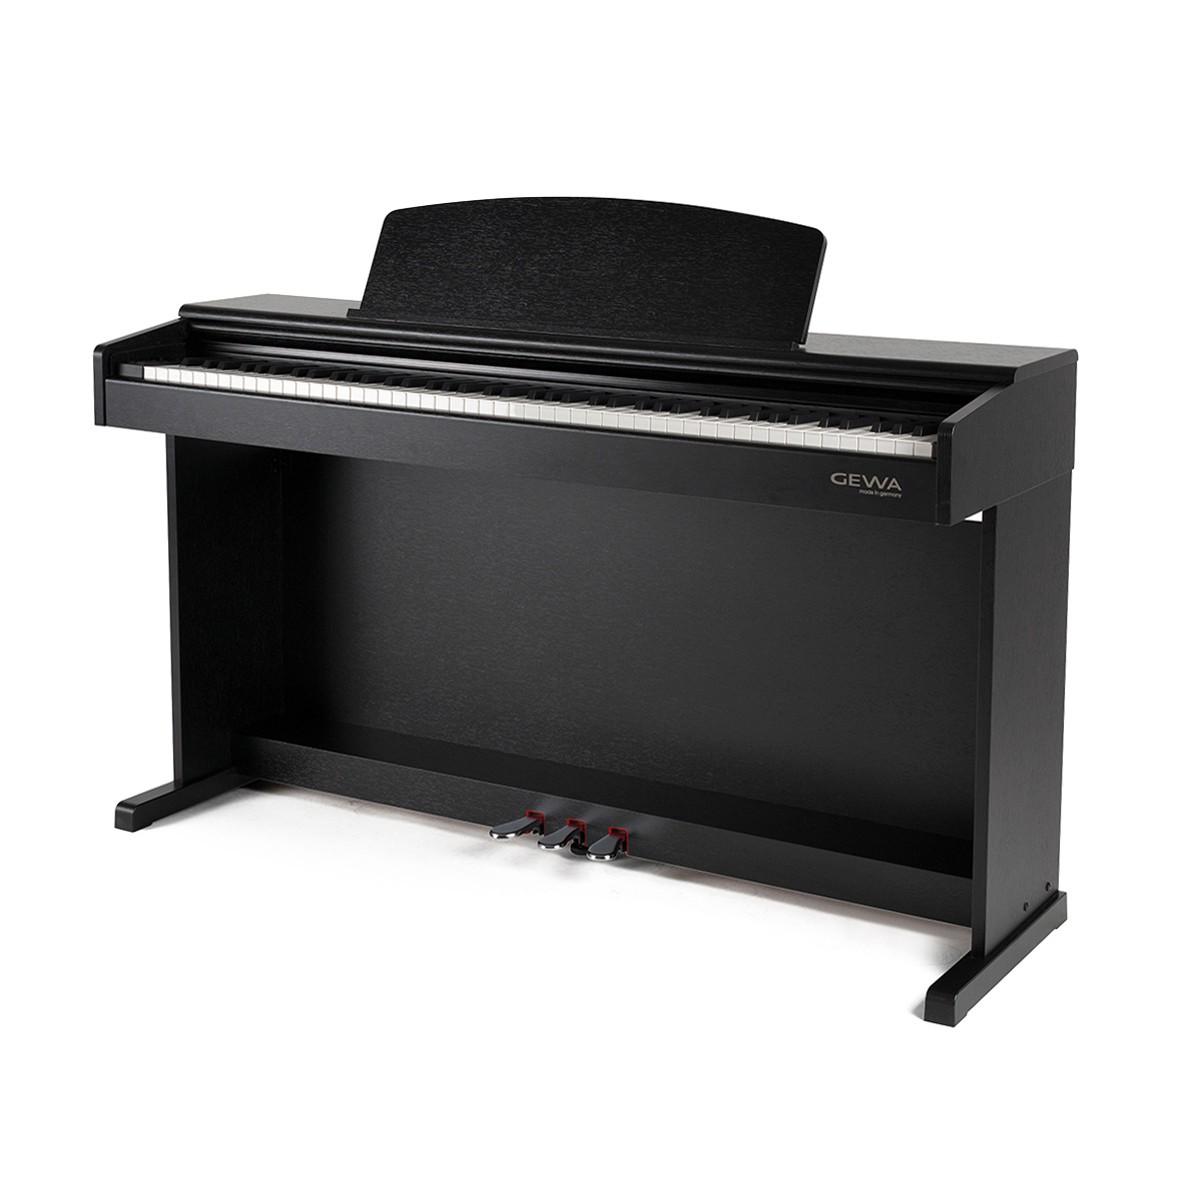 Gewa ePiano DP-300 black